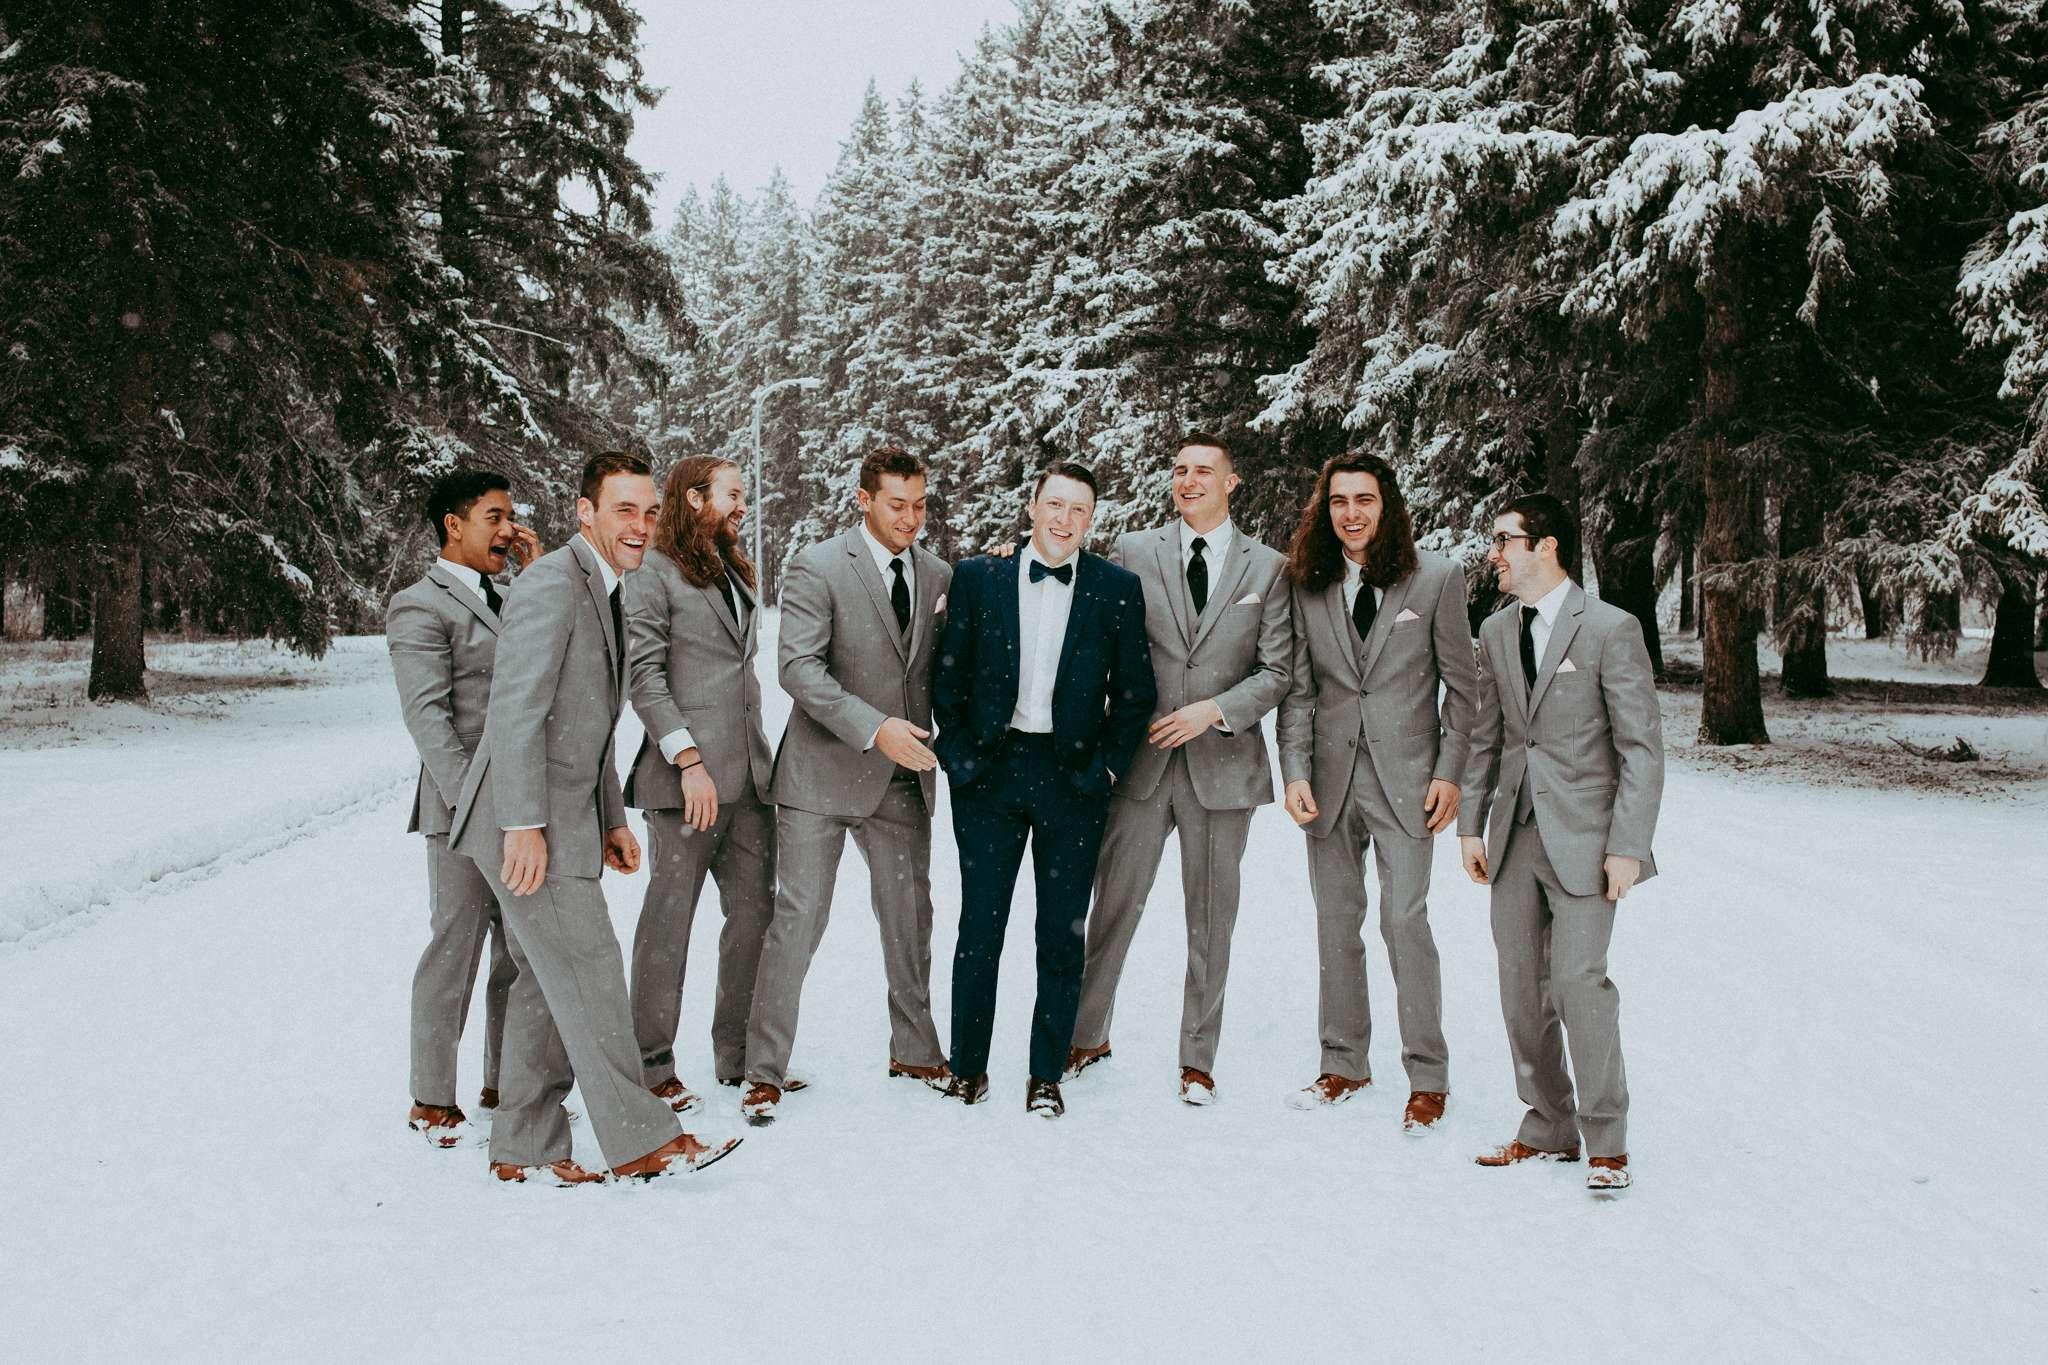 winter wedding, calgary photographer, calgary photographers, calgary wedding photographers, calgary wedding photographer